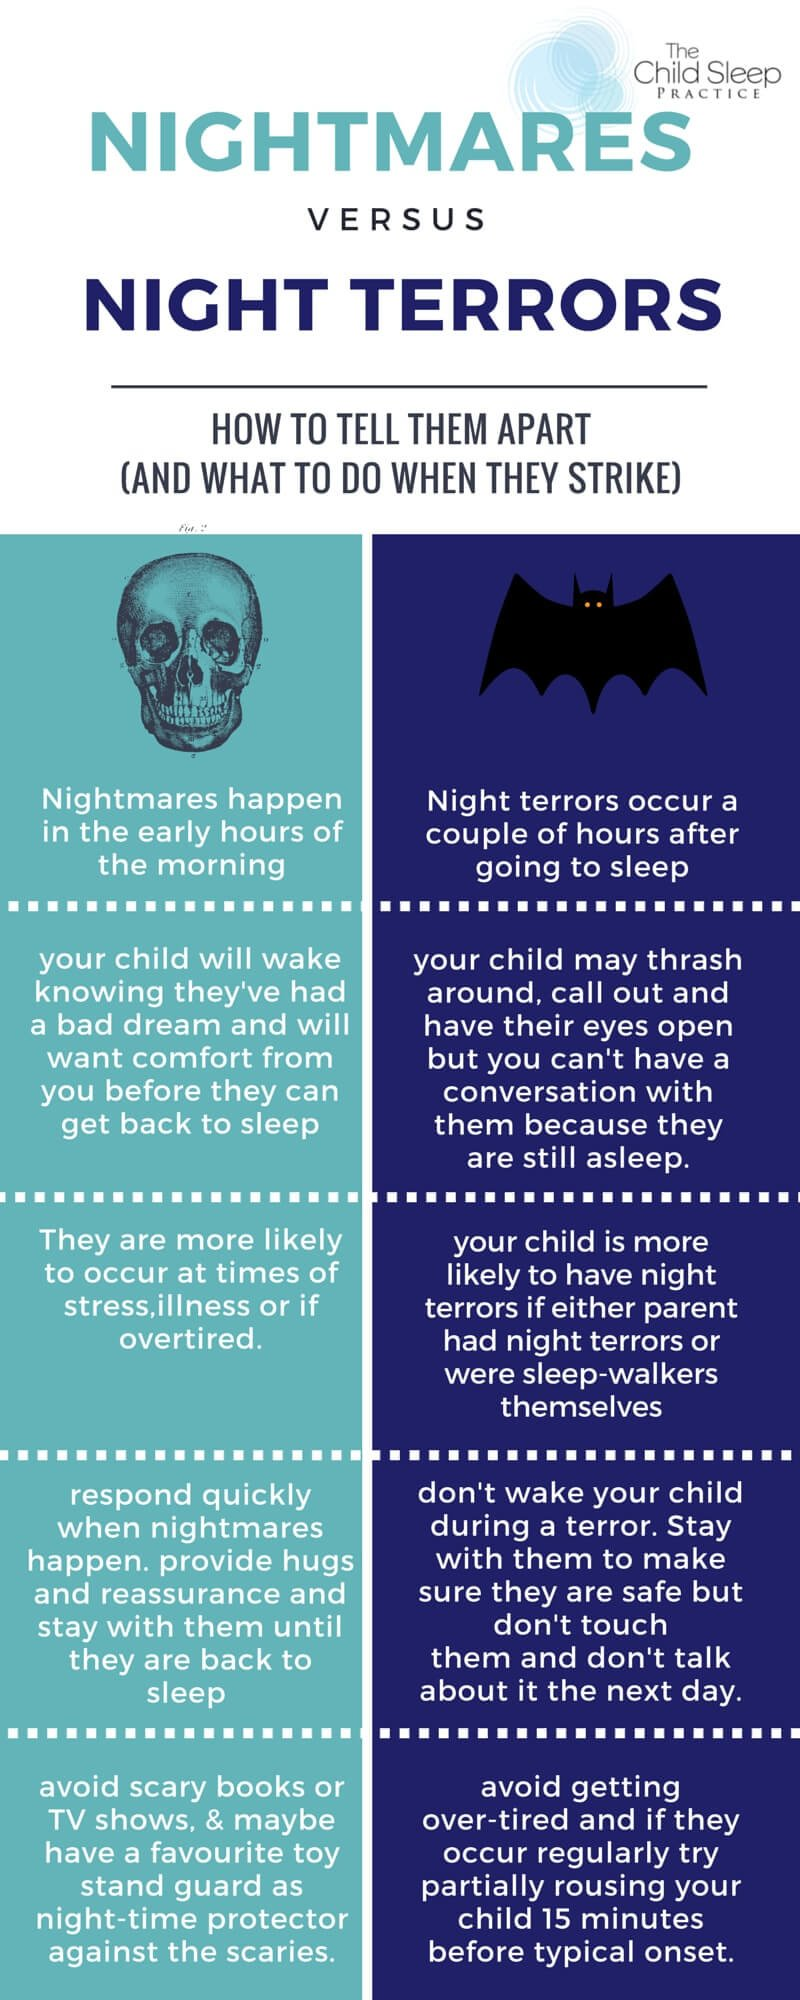 How to Treat Night Terrors